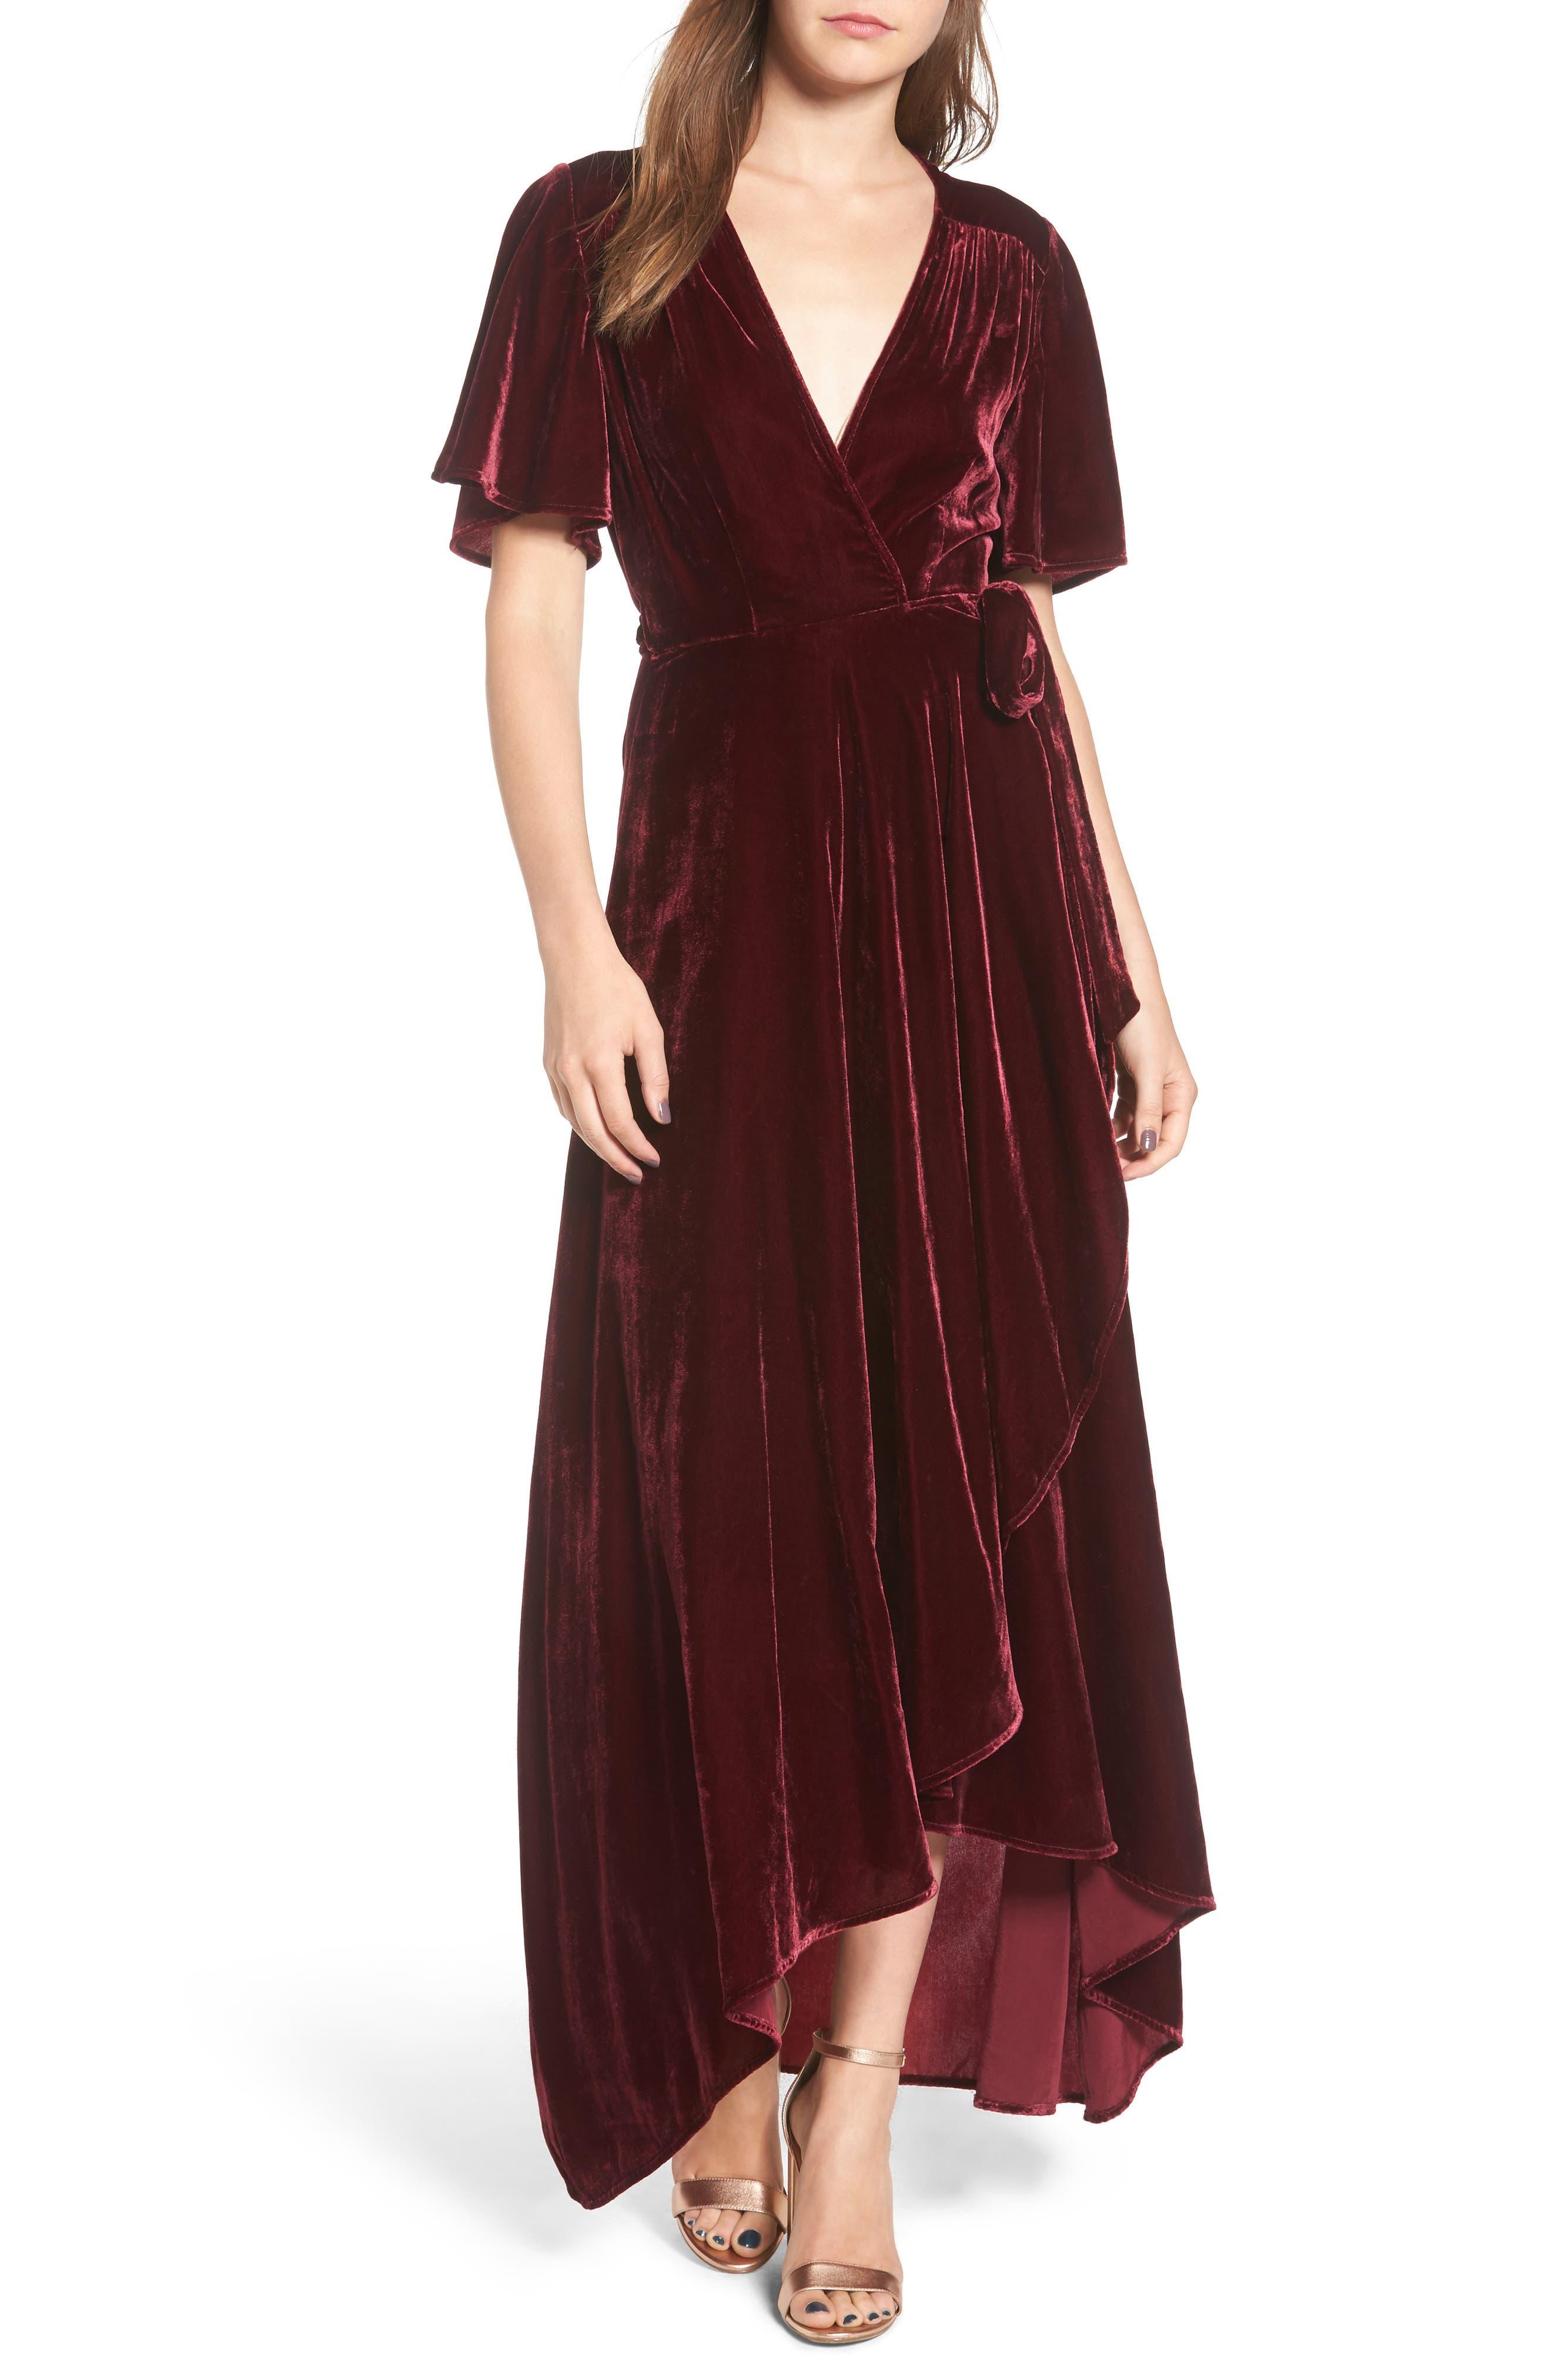 Privacy Please Velvet Wrap Maxi Dress